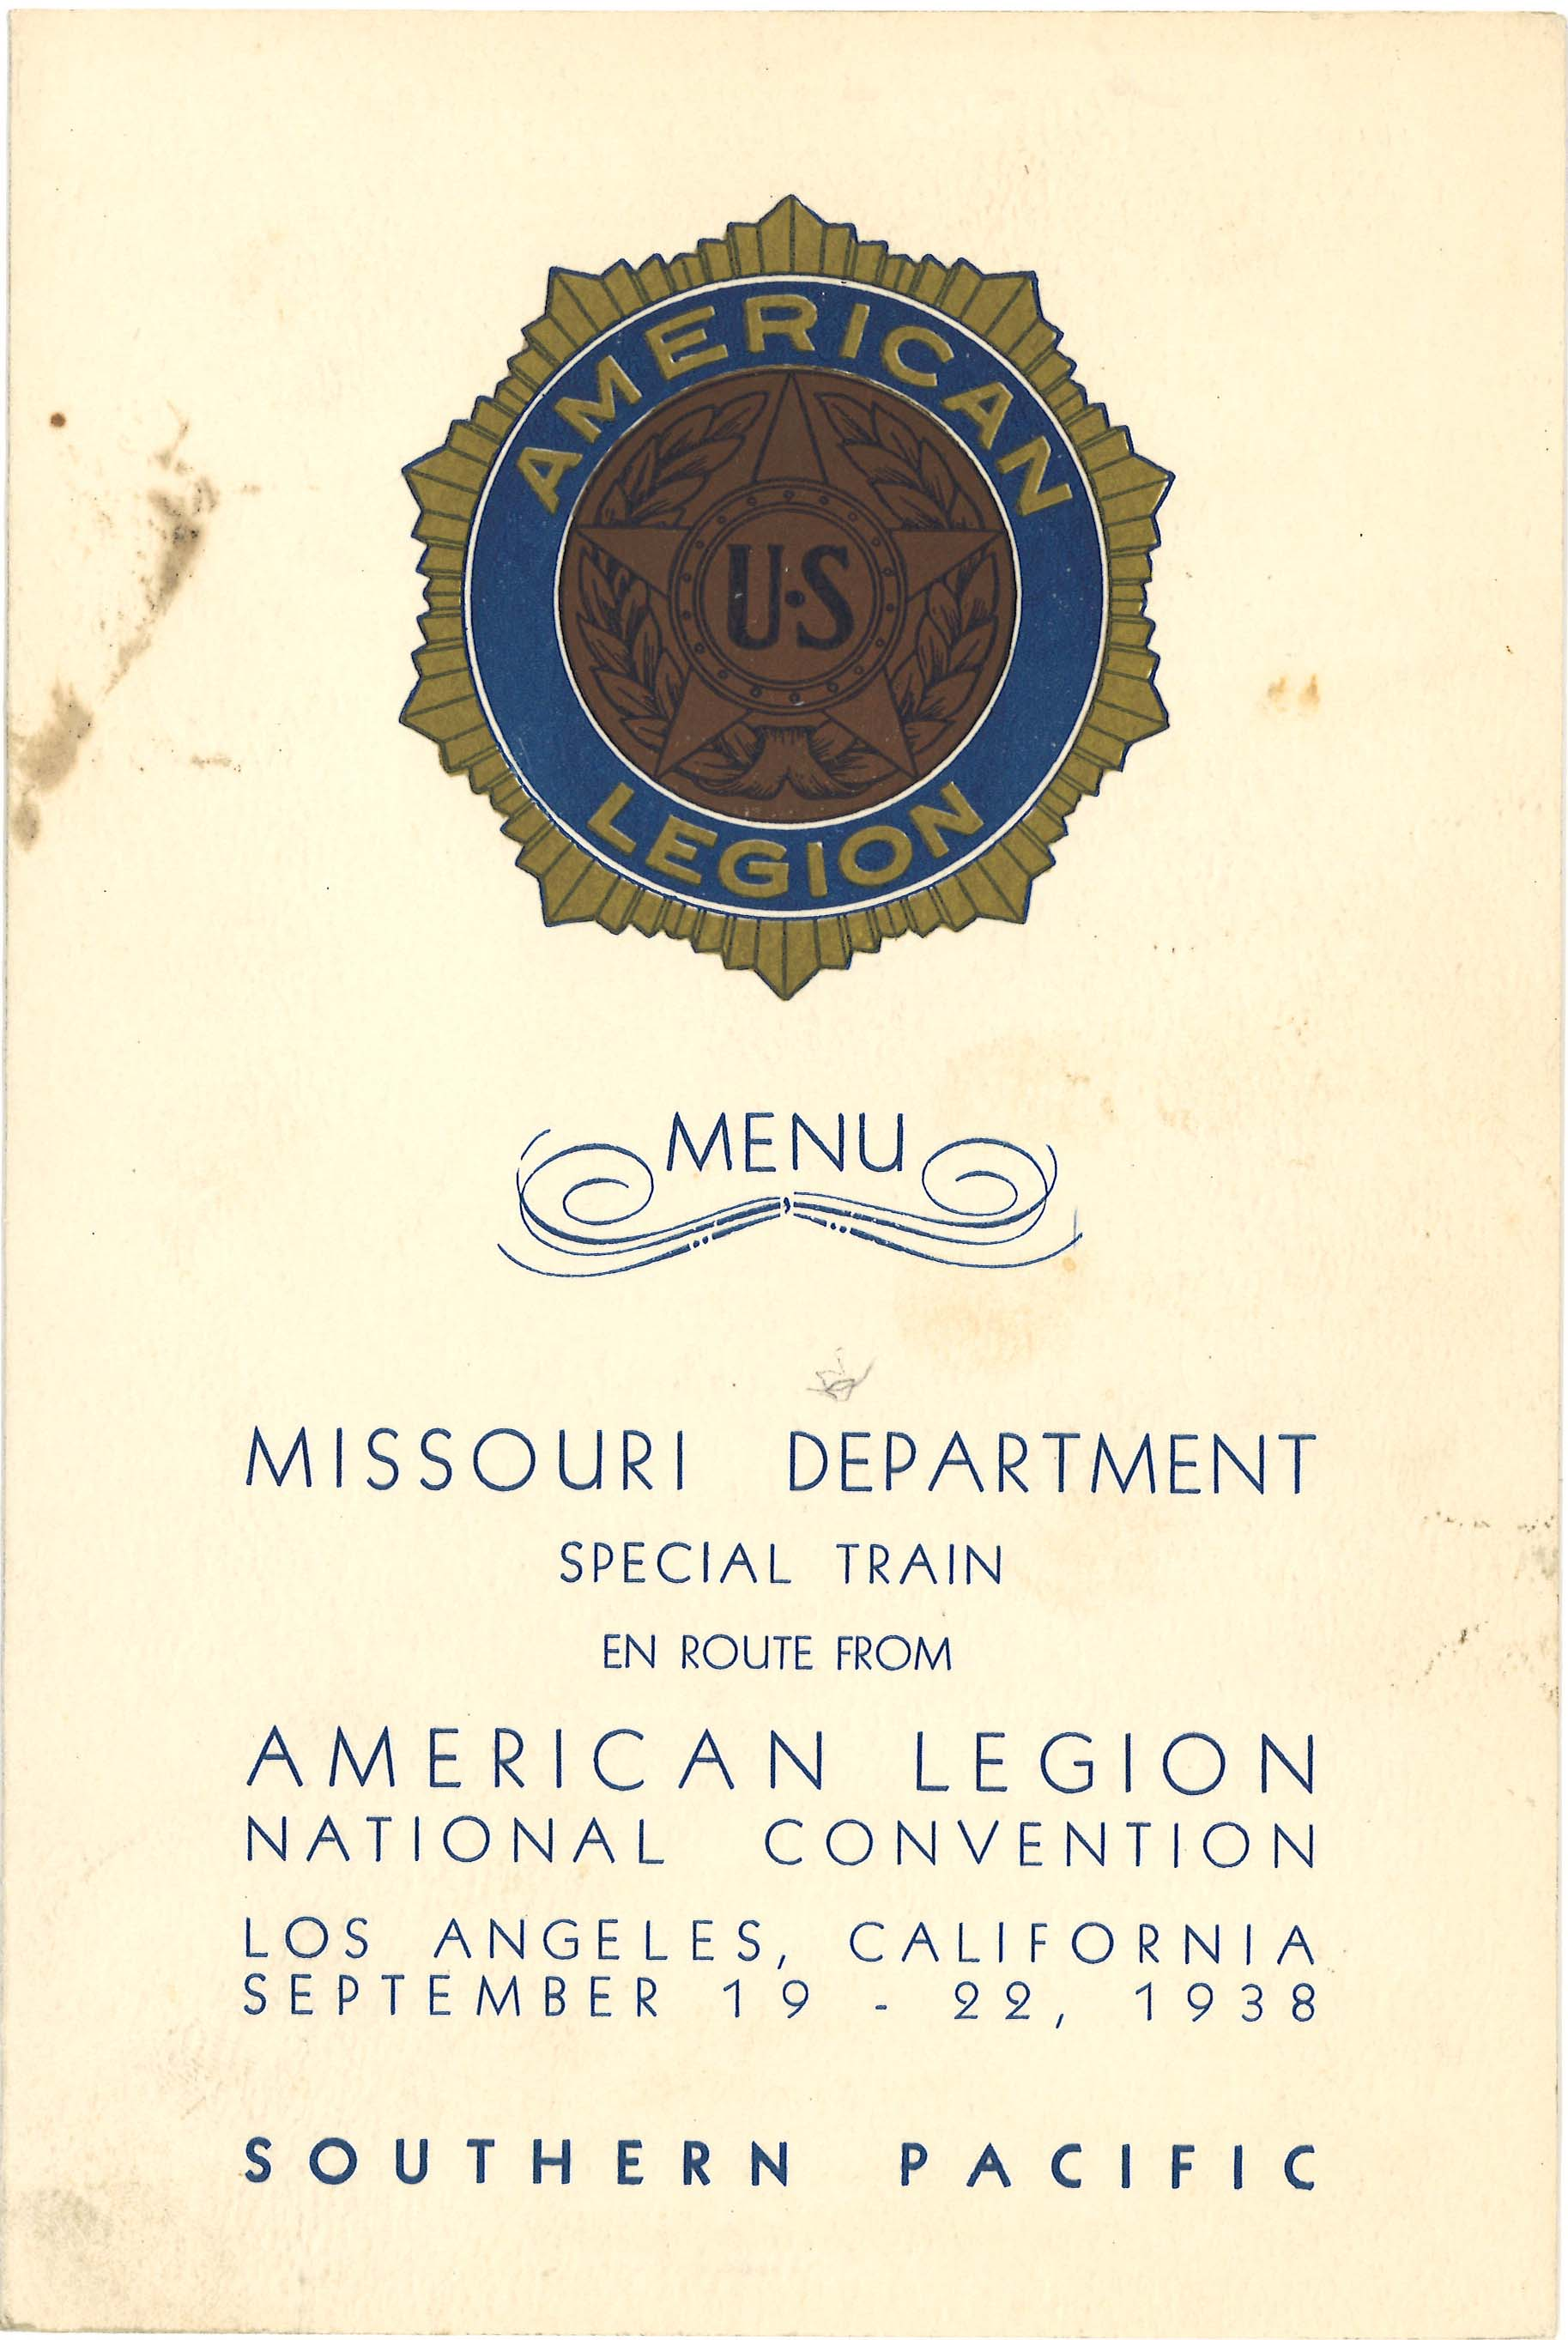 SP Missouri Department CV_small.jpg